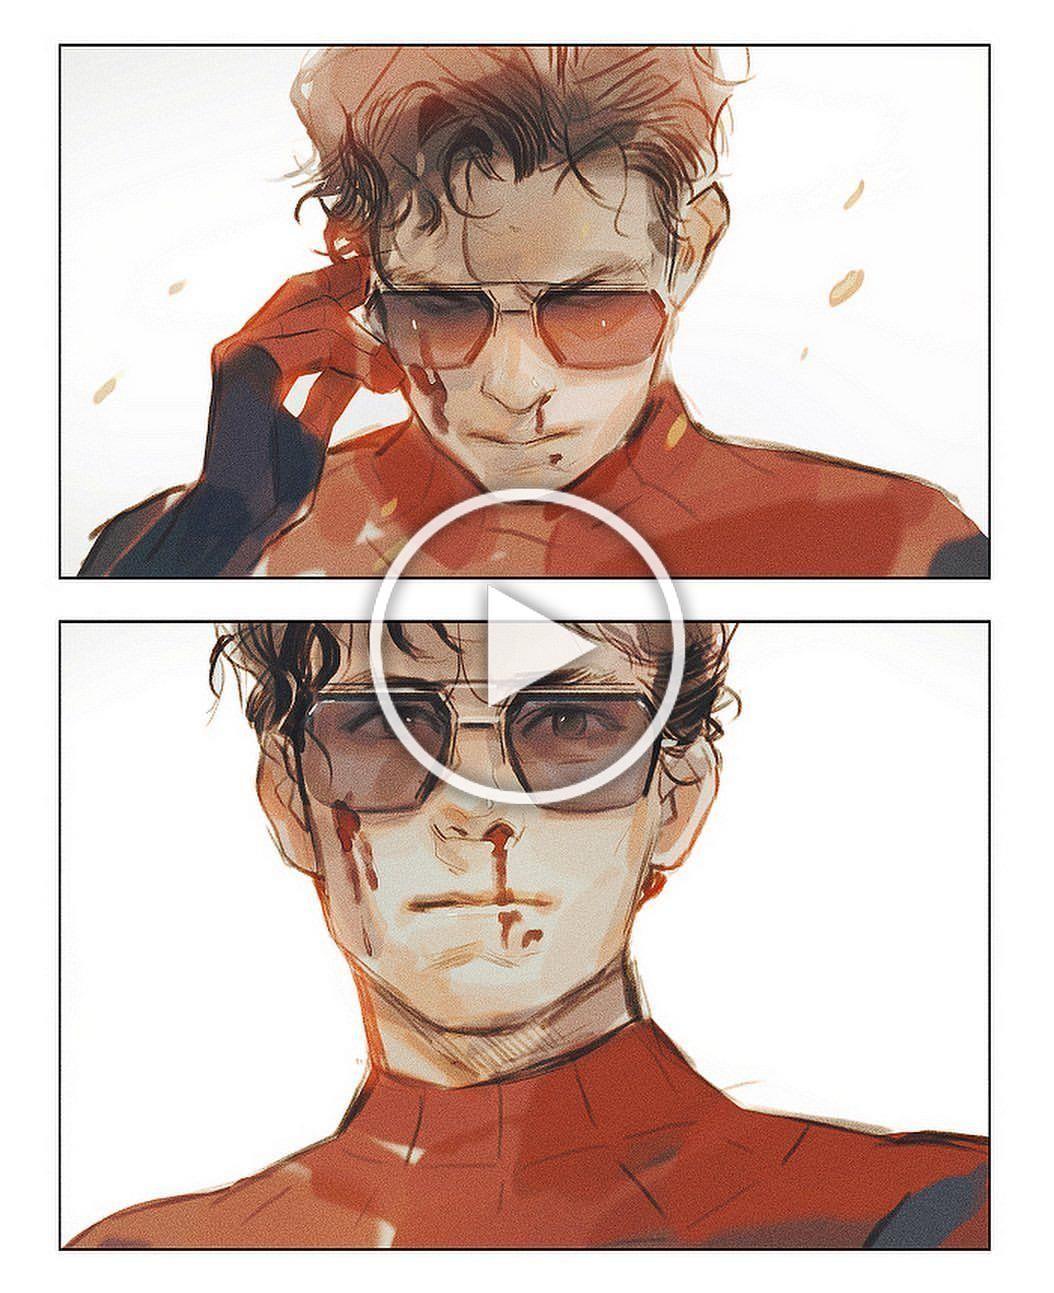 #illustration #spidermanfarfromhome #spiderman #peterparker #ironman #tonystark #tomholland #robertdowneyjr #Marvel